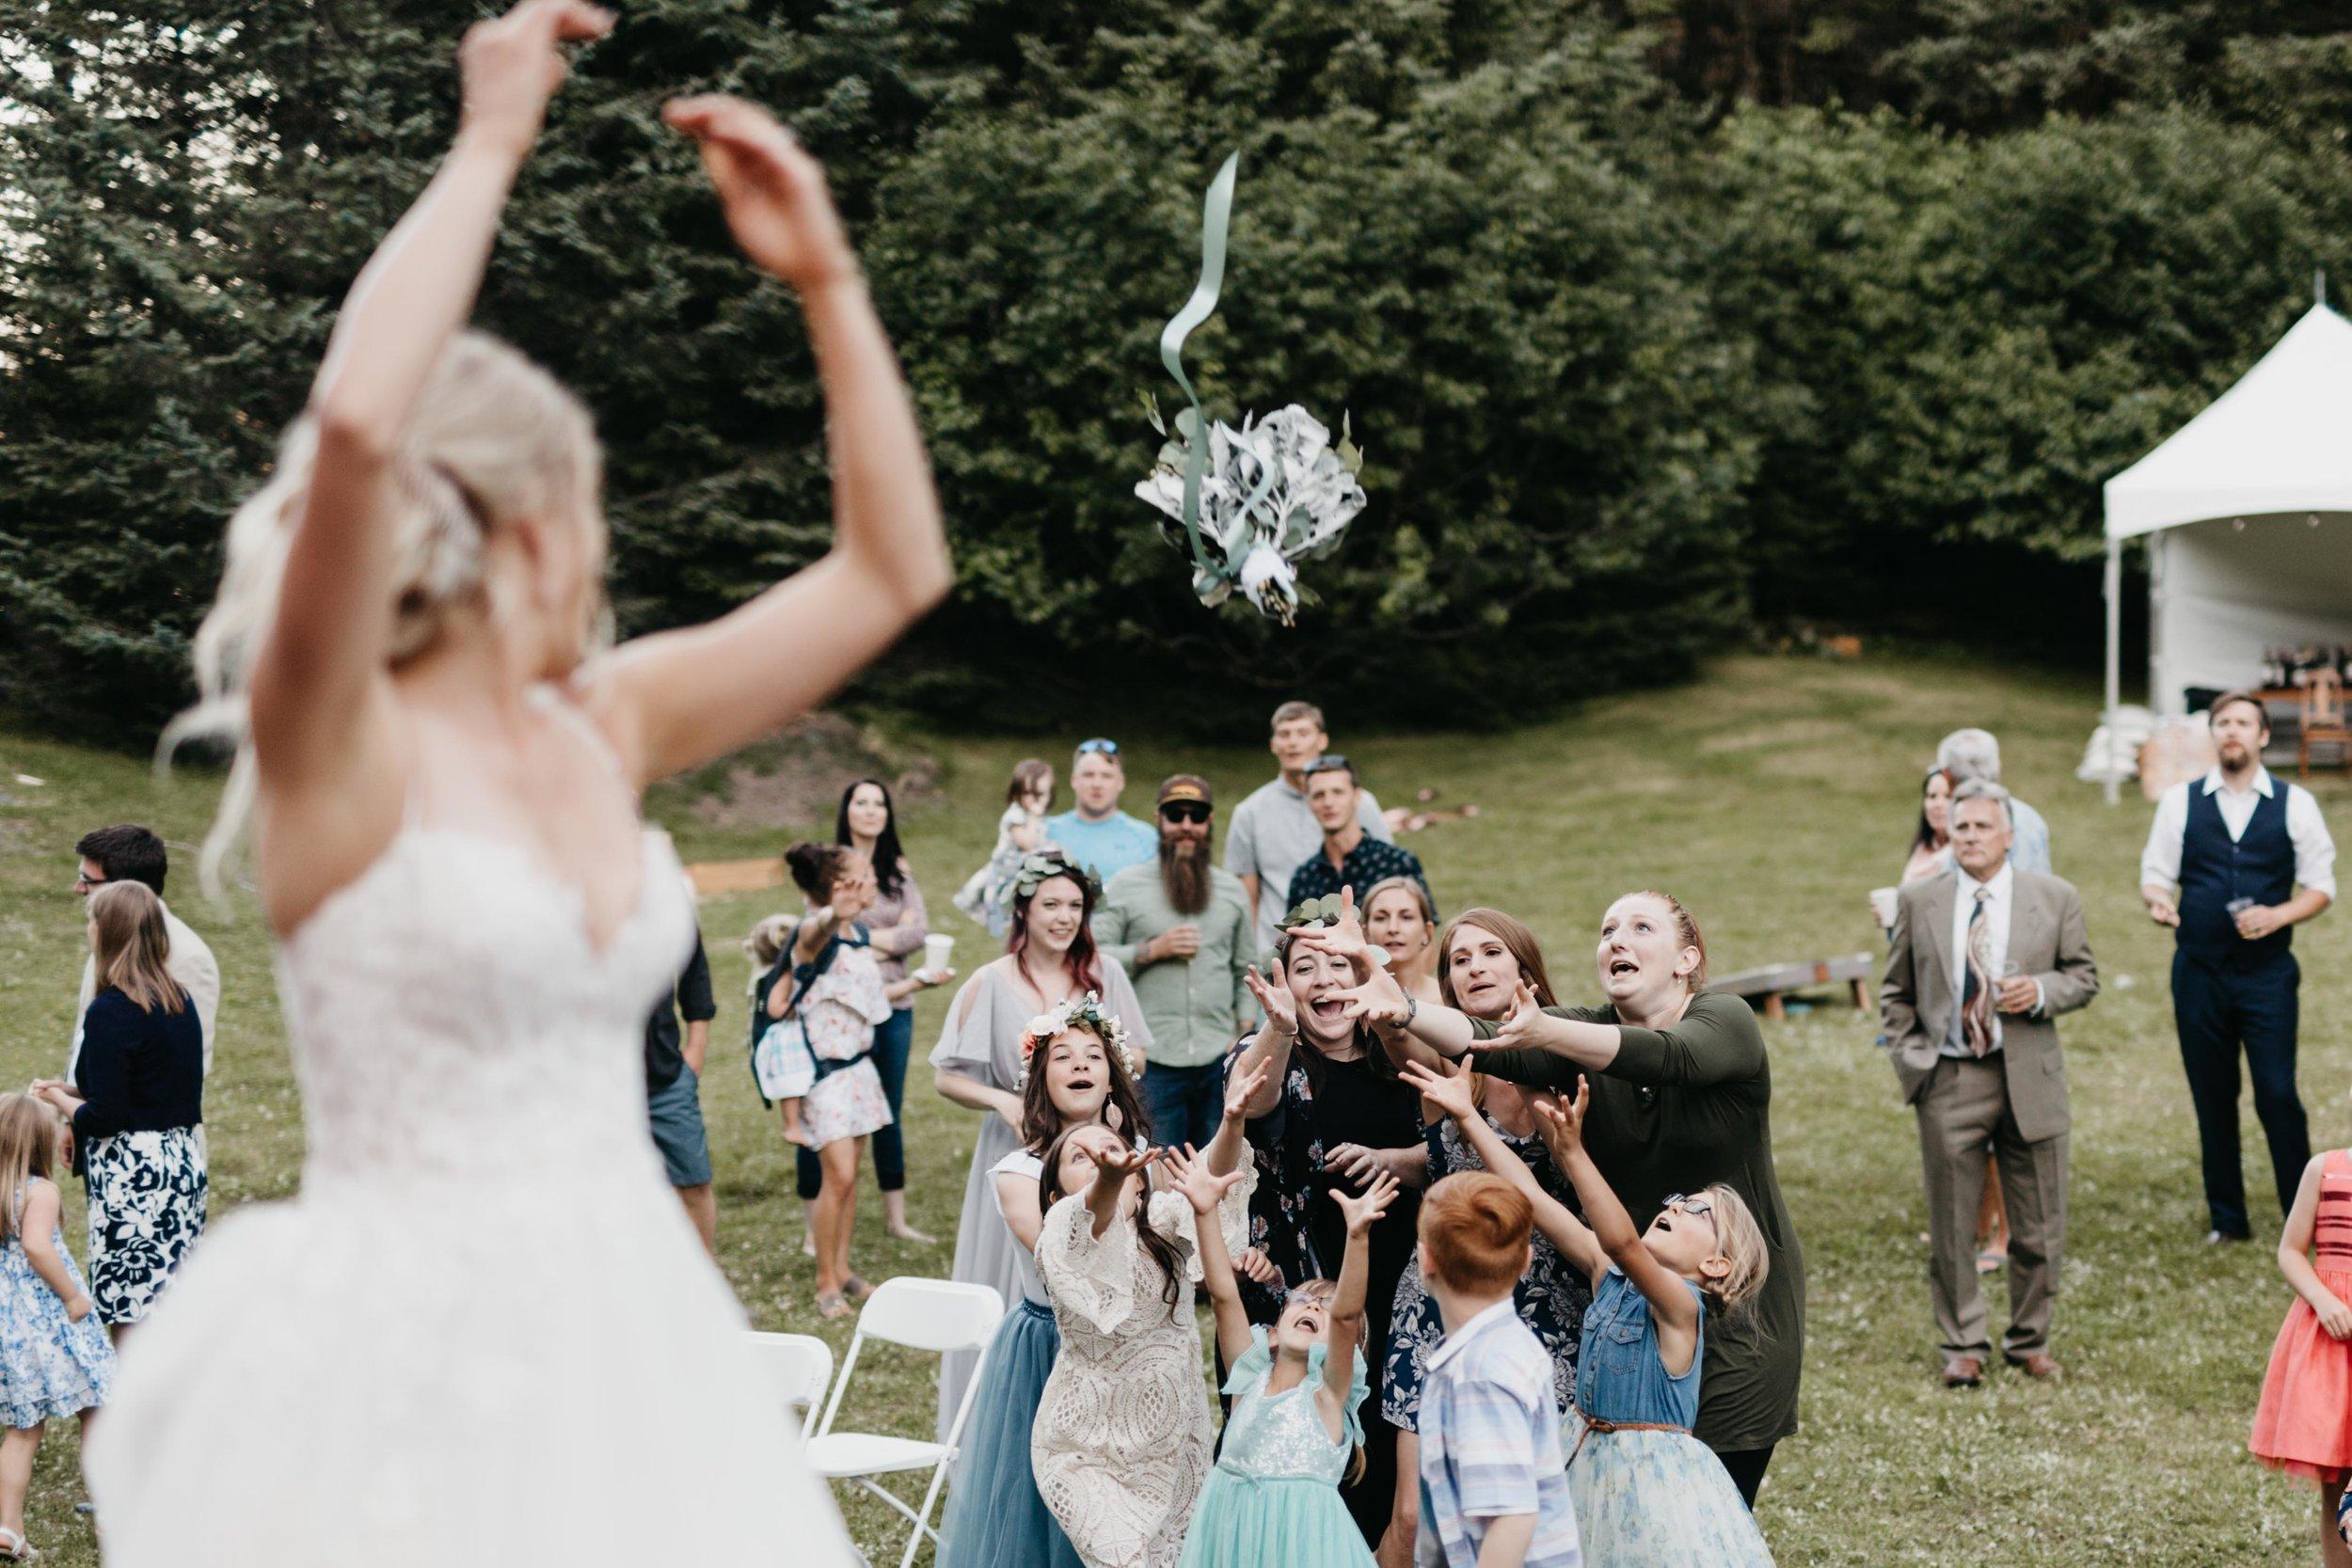 Utah-Wedding-Photographer-134.jpg